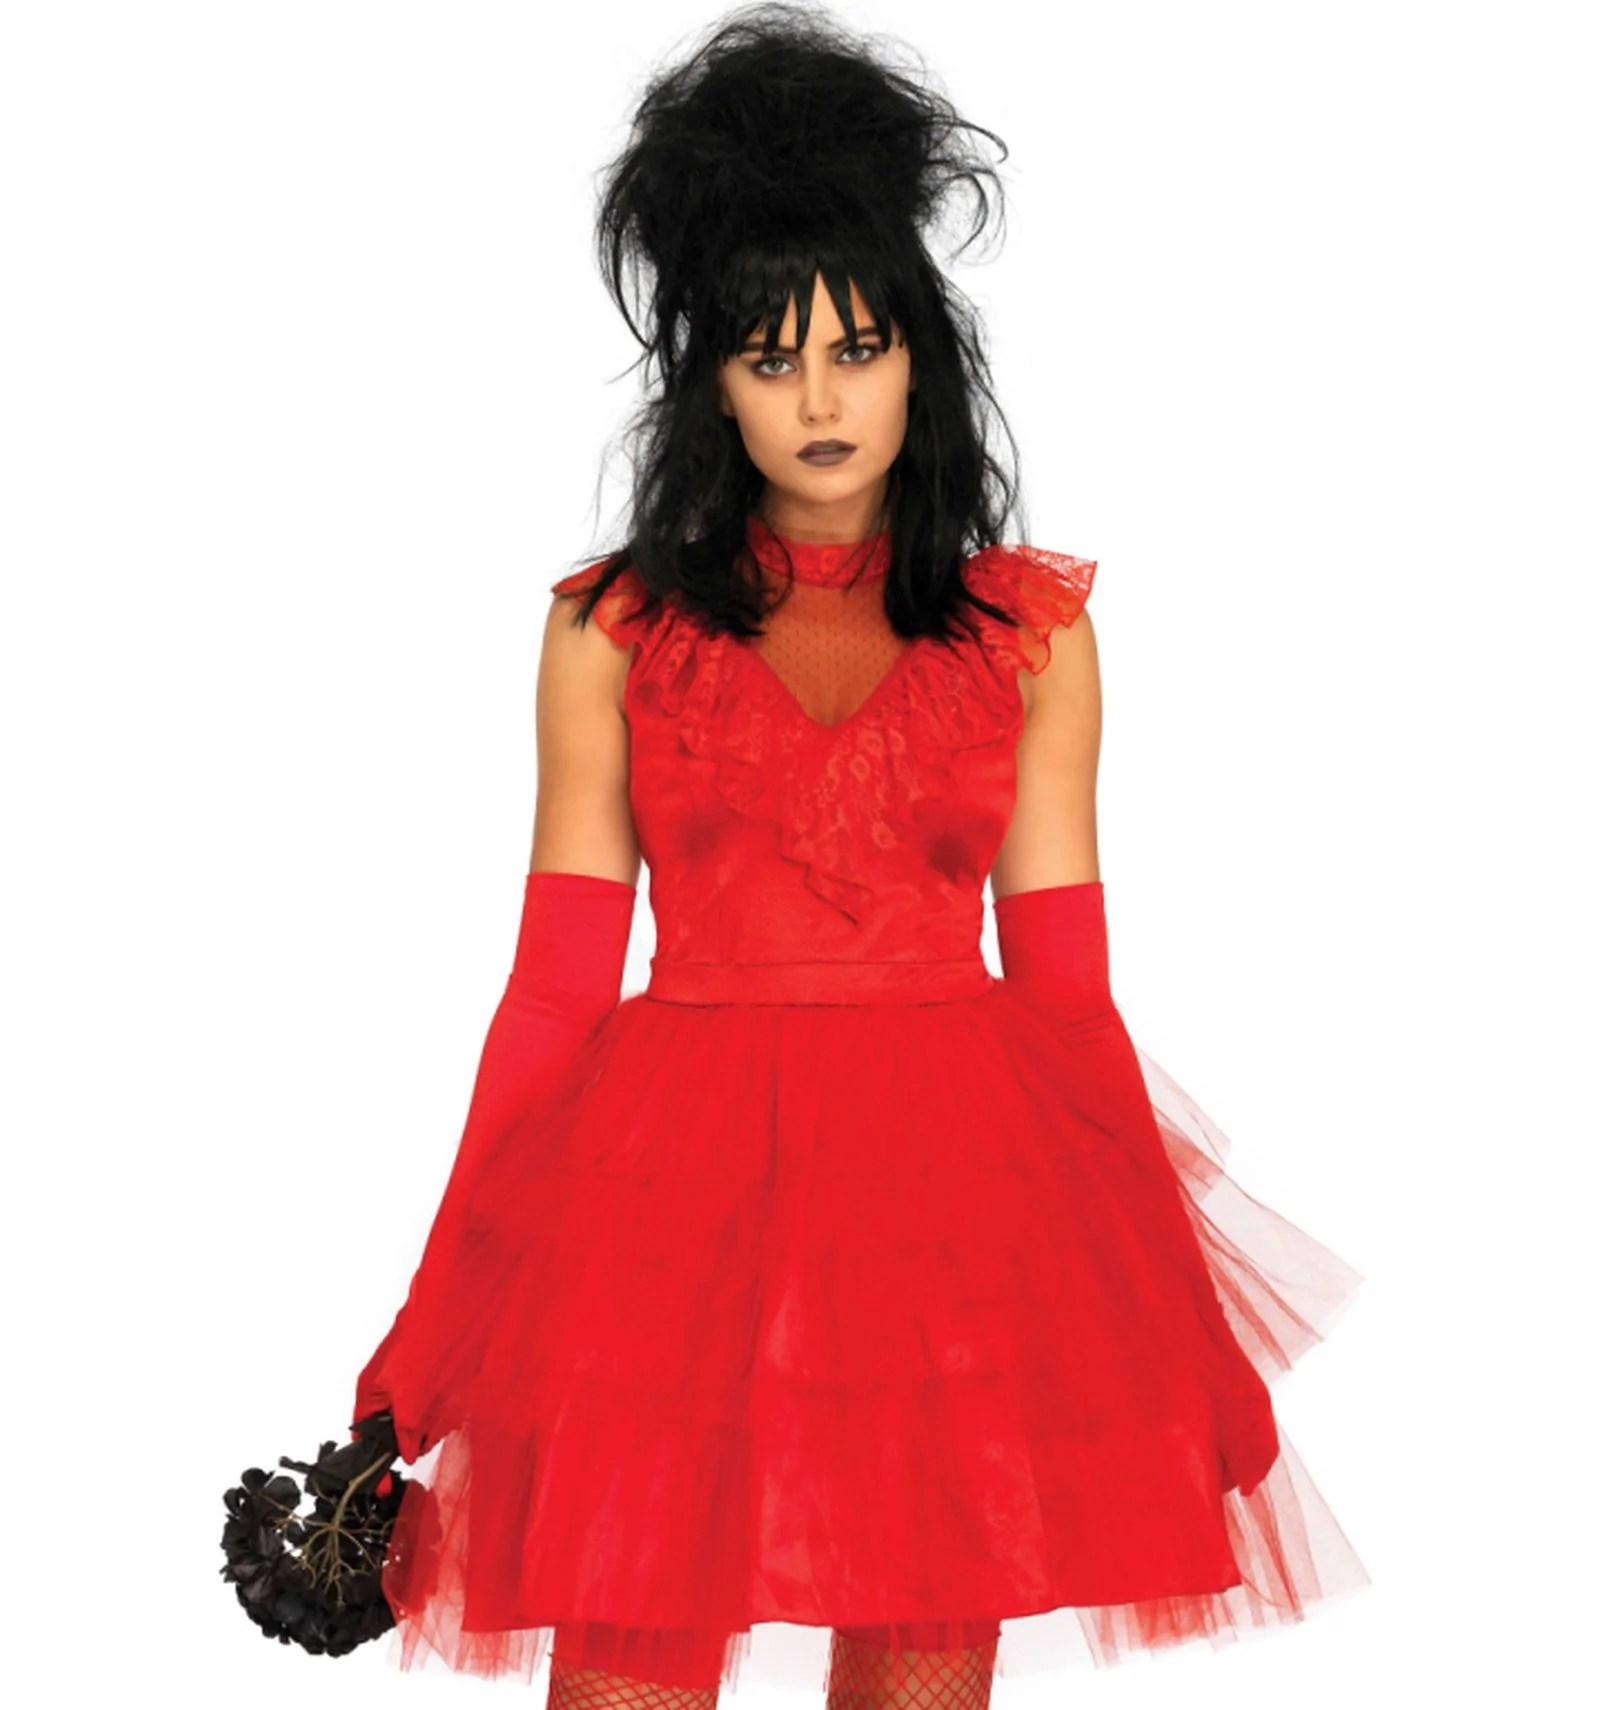 80s punk prom princess